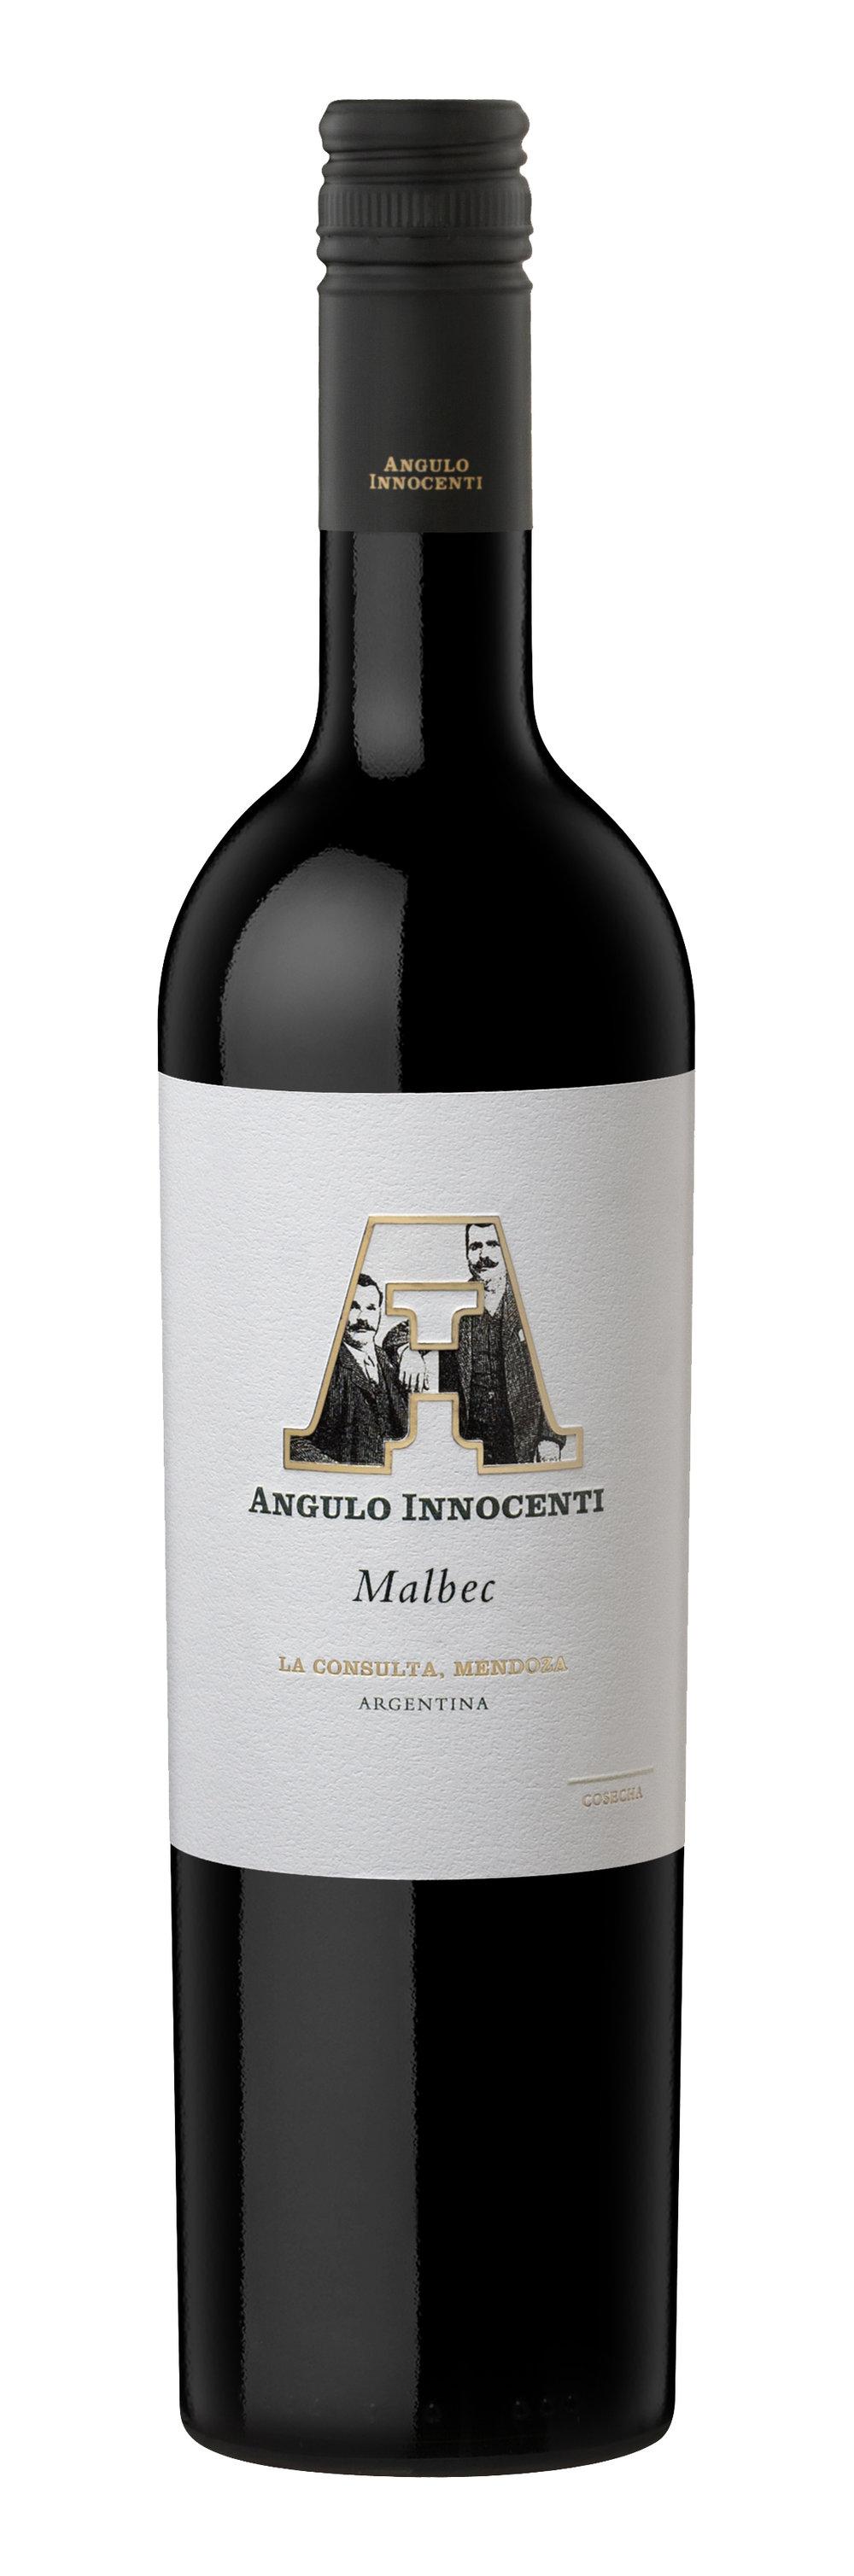 Angulo Innocenti Malbec Bottle.jpg